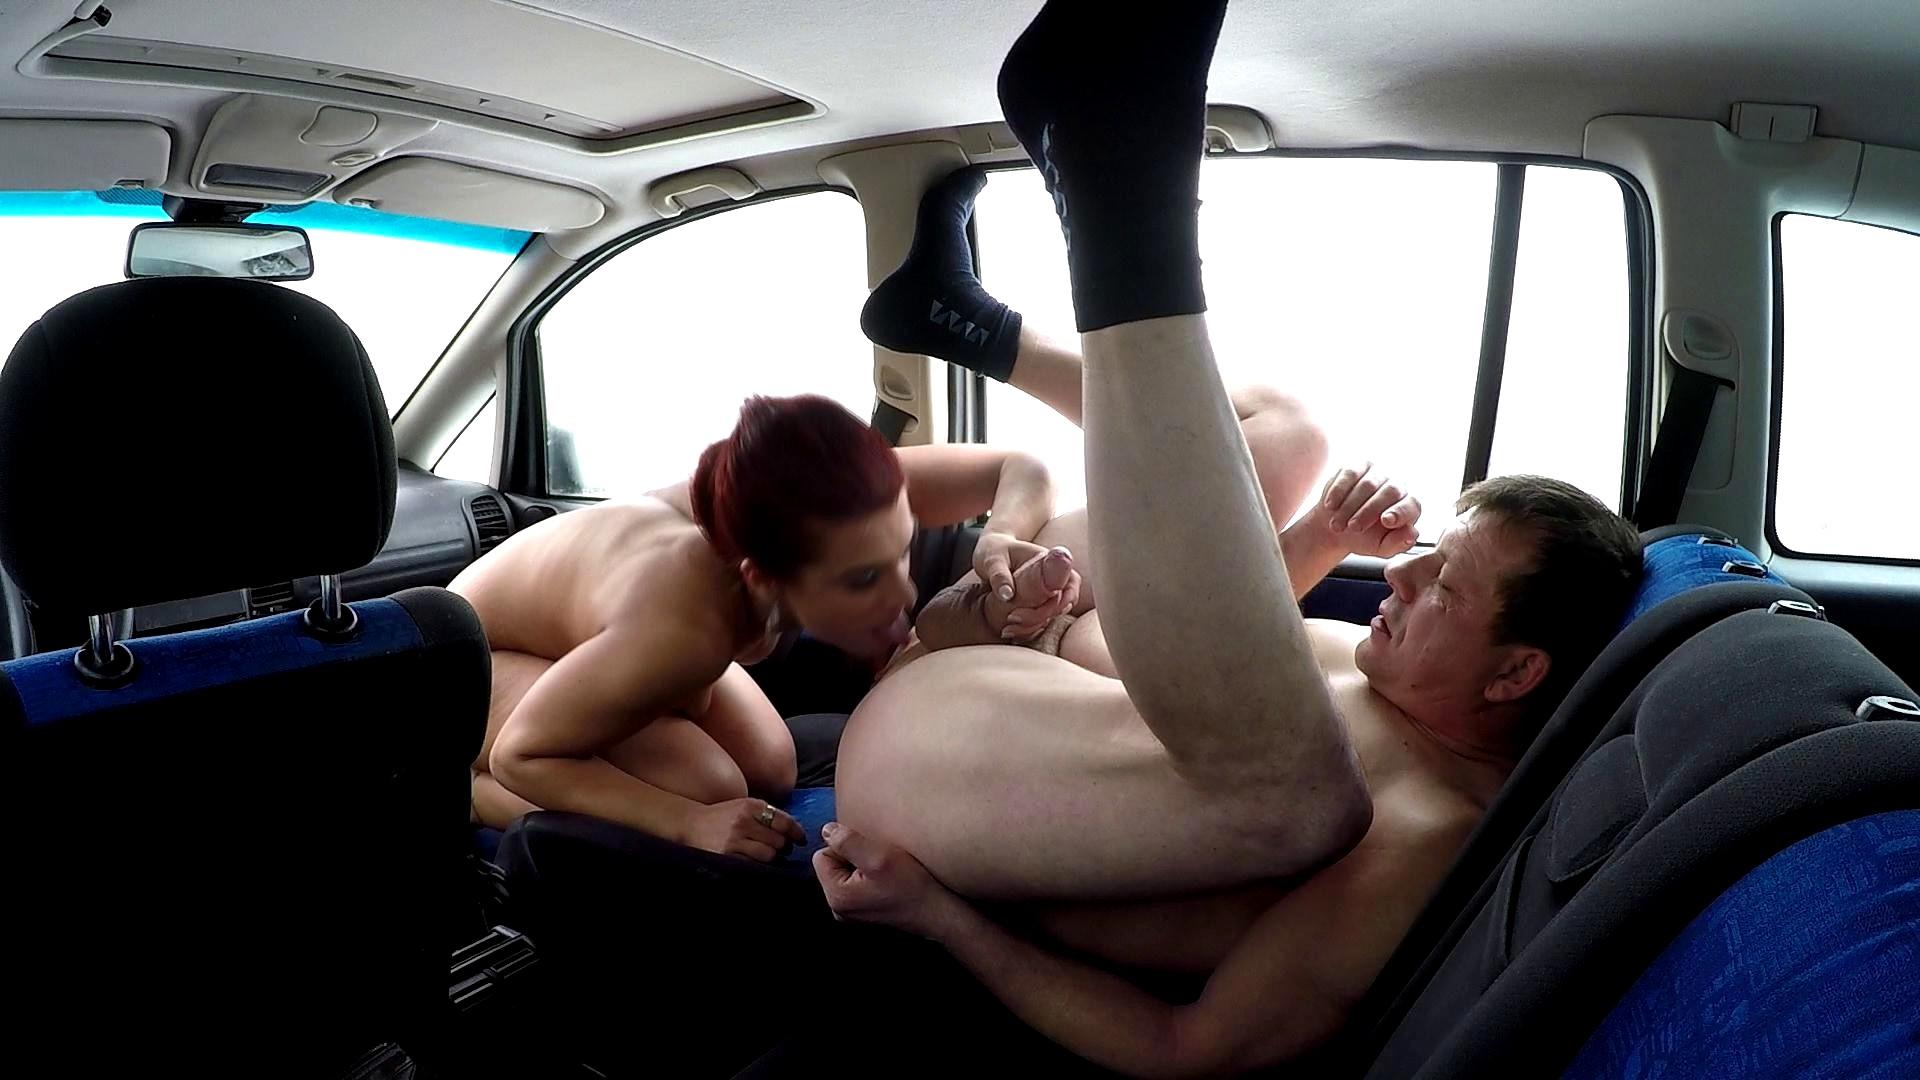 Real Czech Prostitute Takes Money For Car Sex Tnaflix Porn Pics